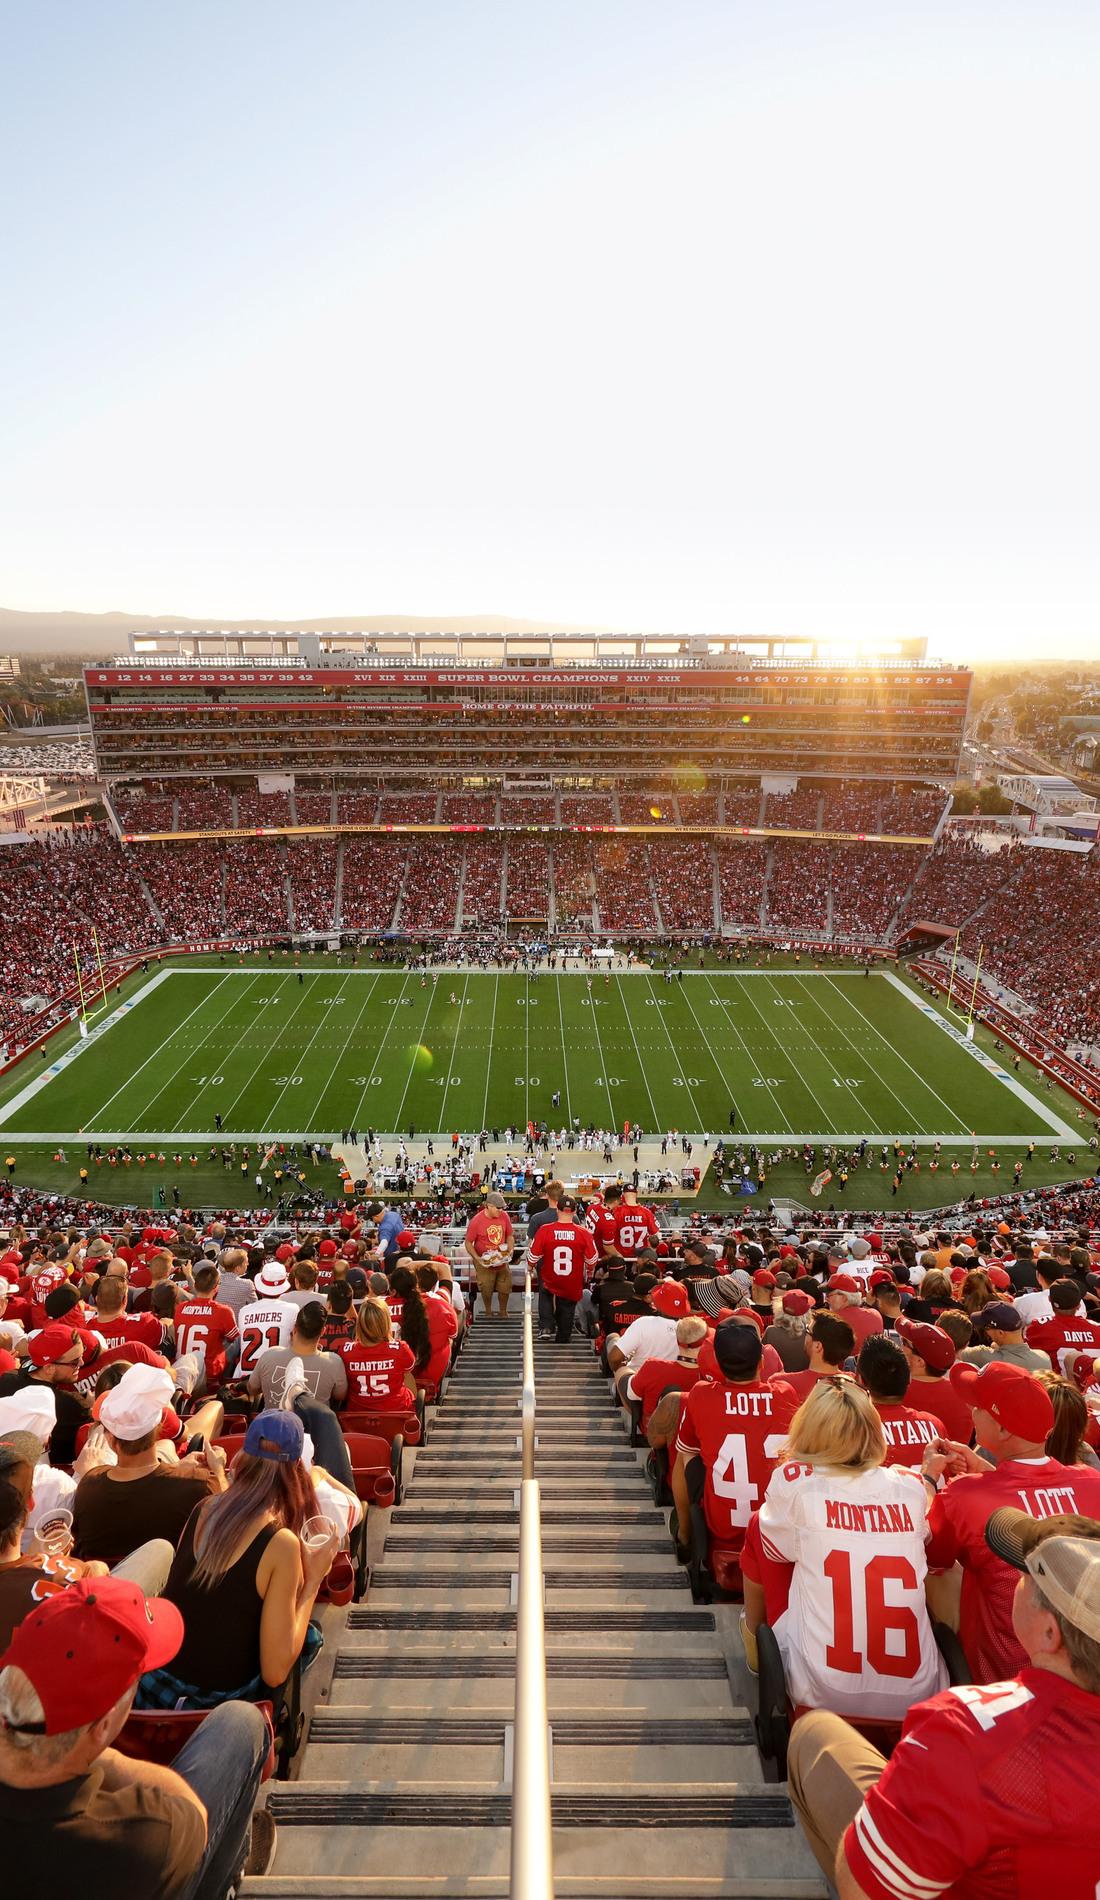 A San Francisco 49ers live event